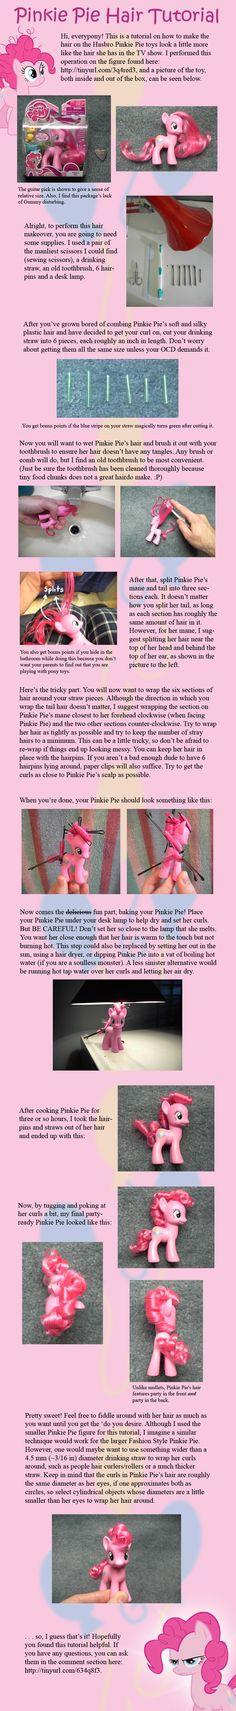 Pinkie Pie Hair Tutorial by ~countschlick on deviantART Awwwww how cute